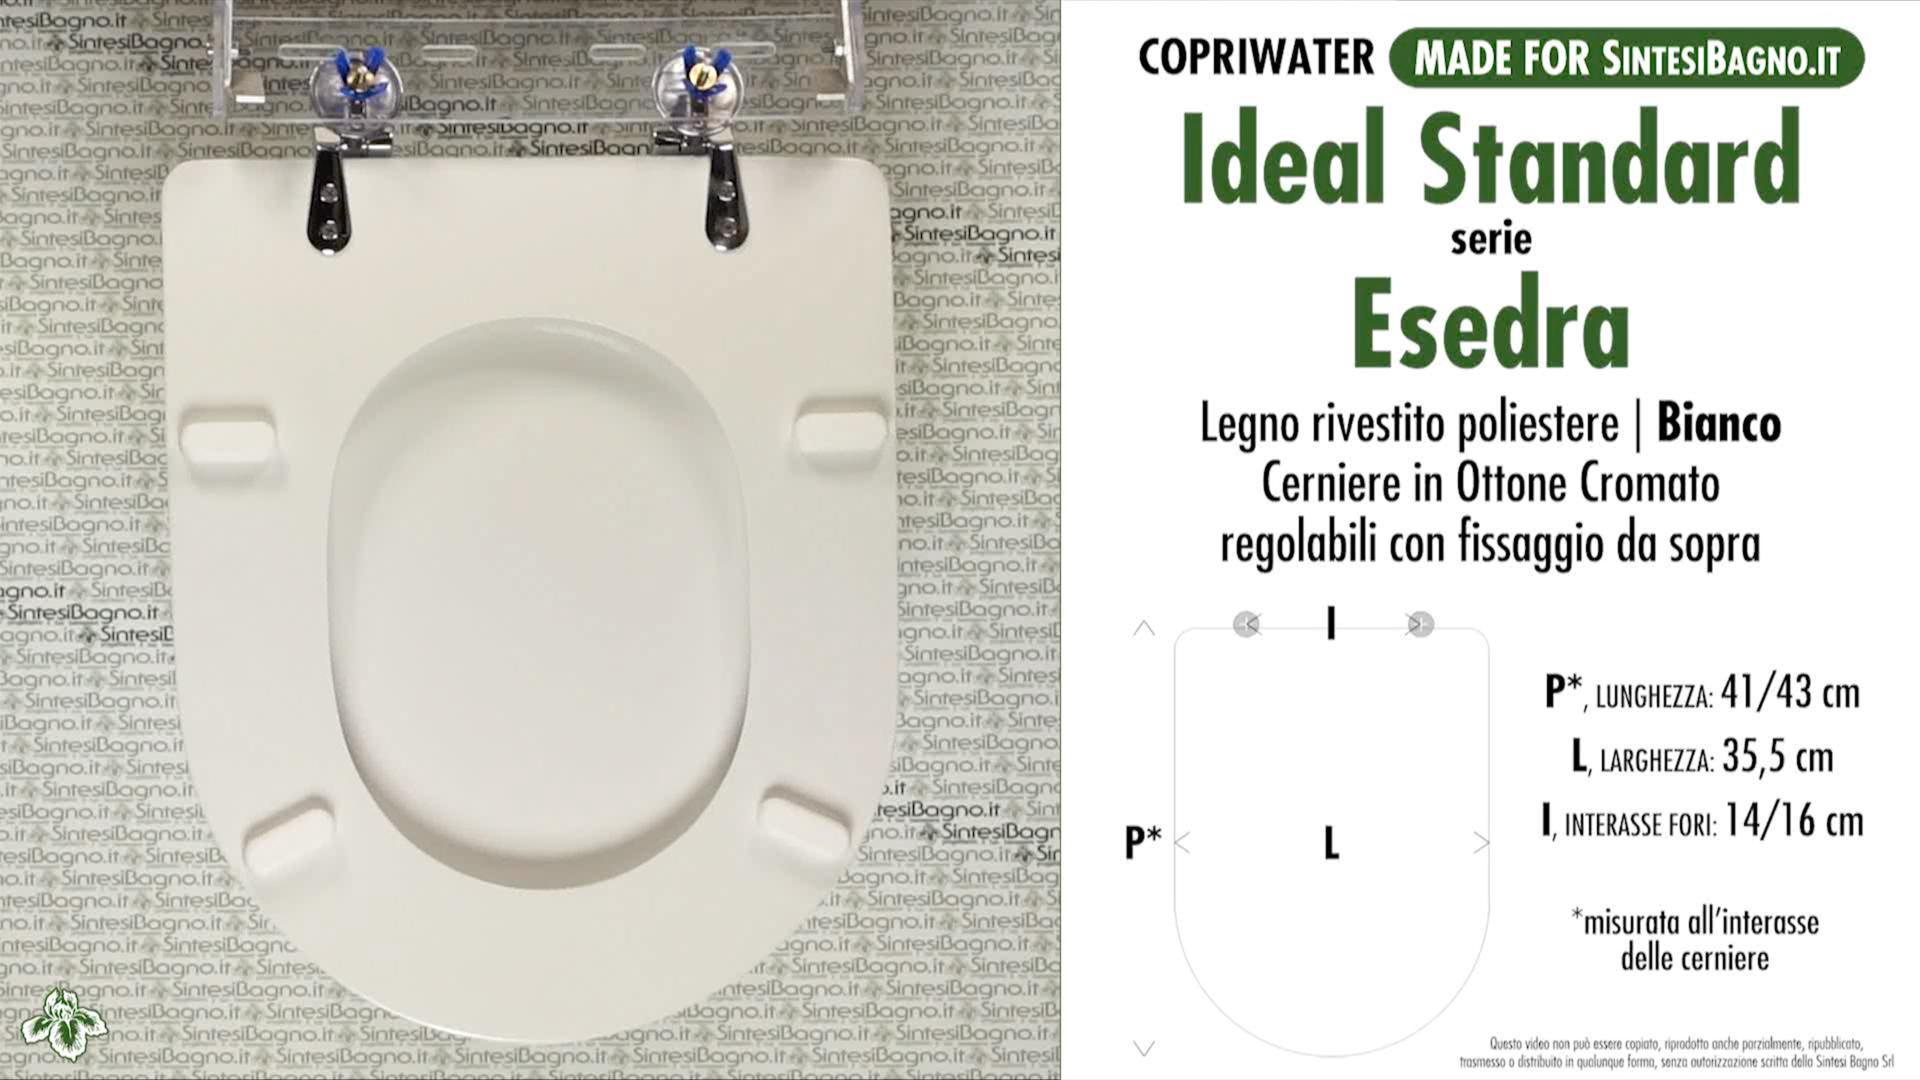 schede tecniche misure copriwater ideal standard serie esedra